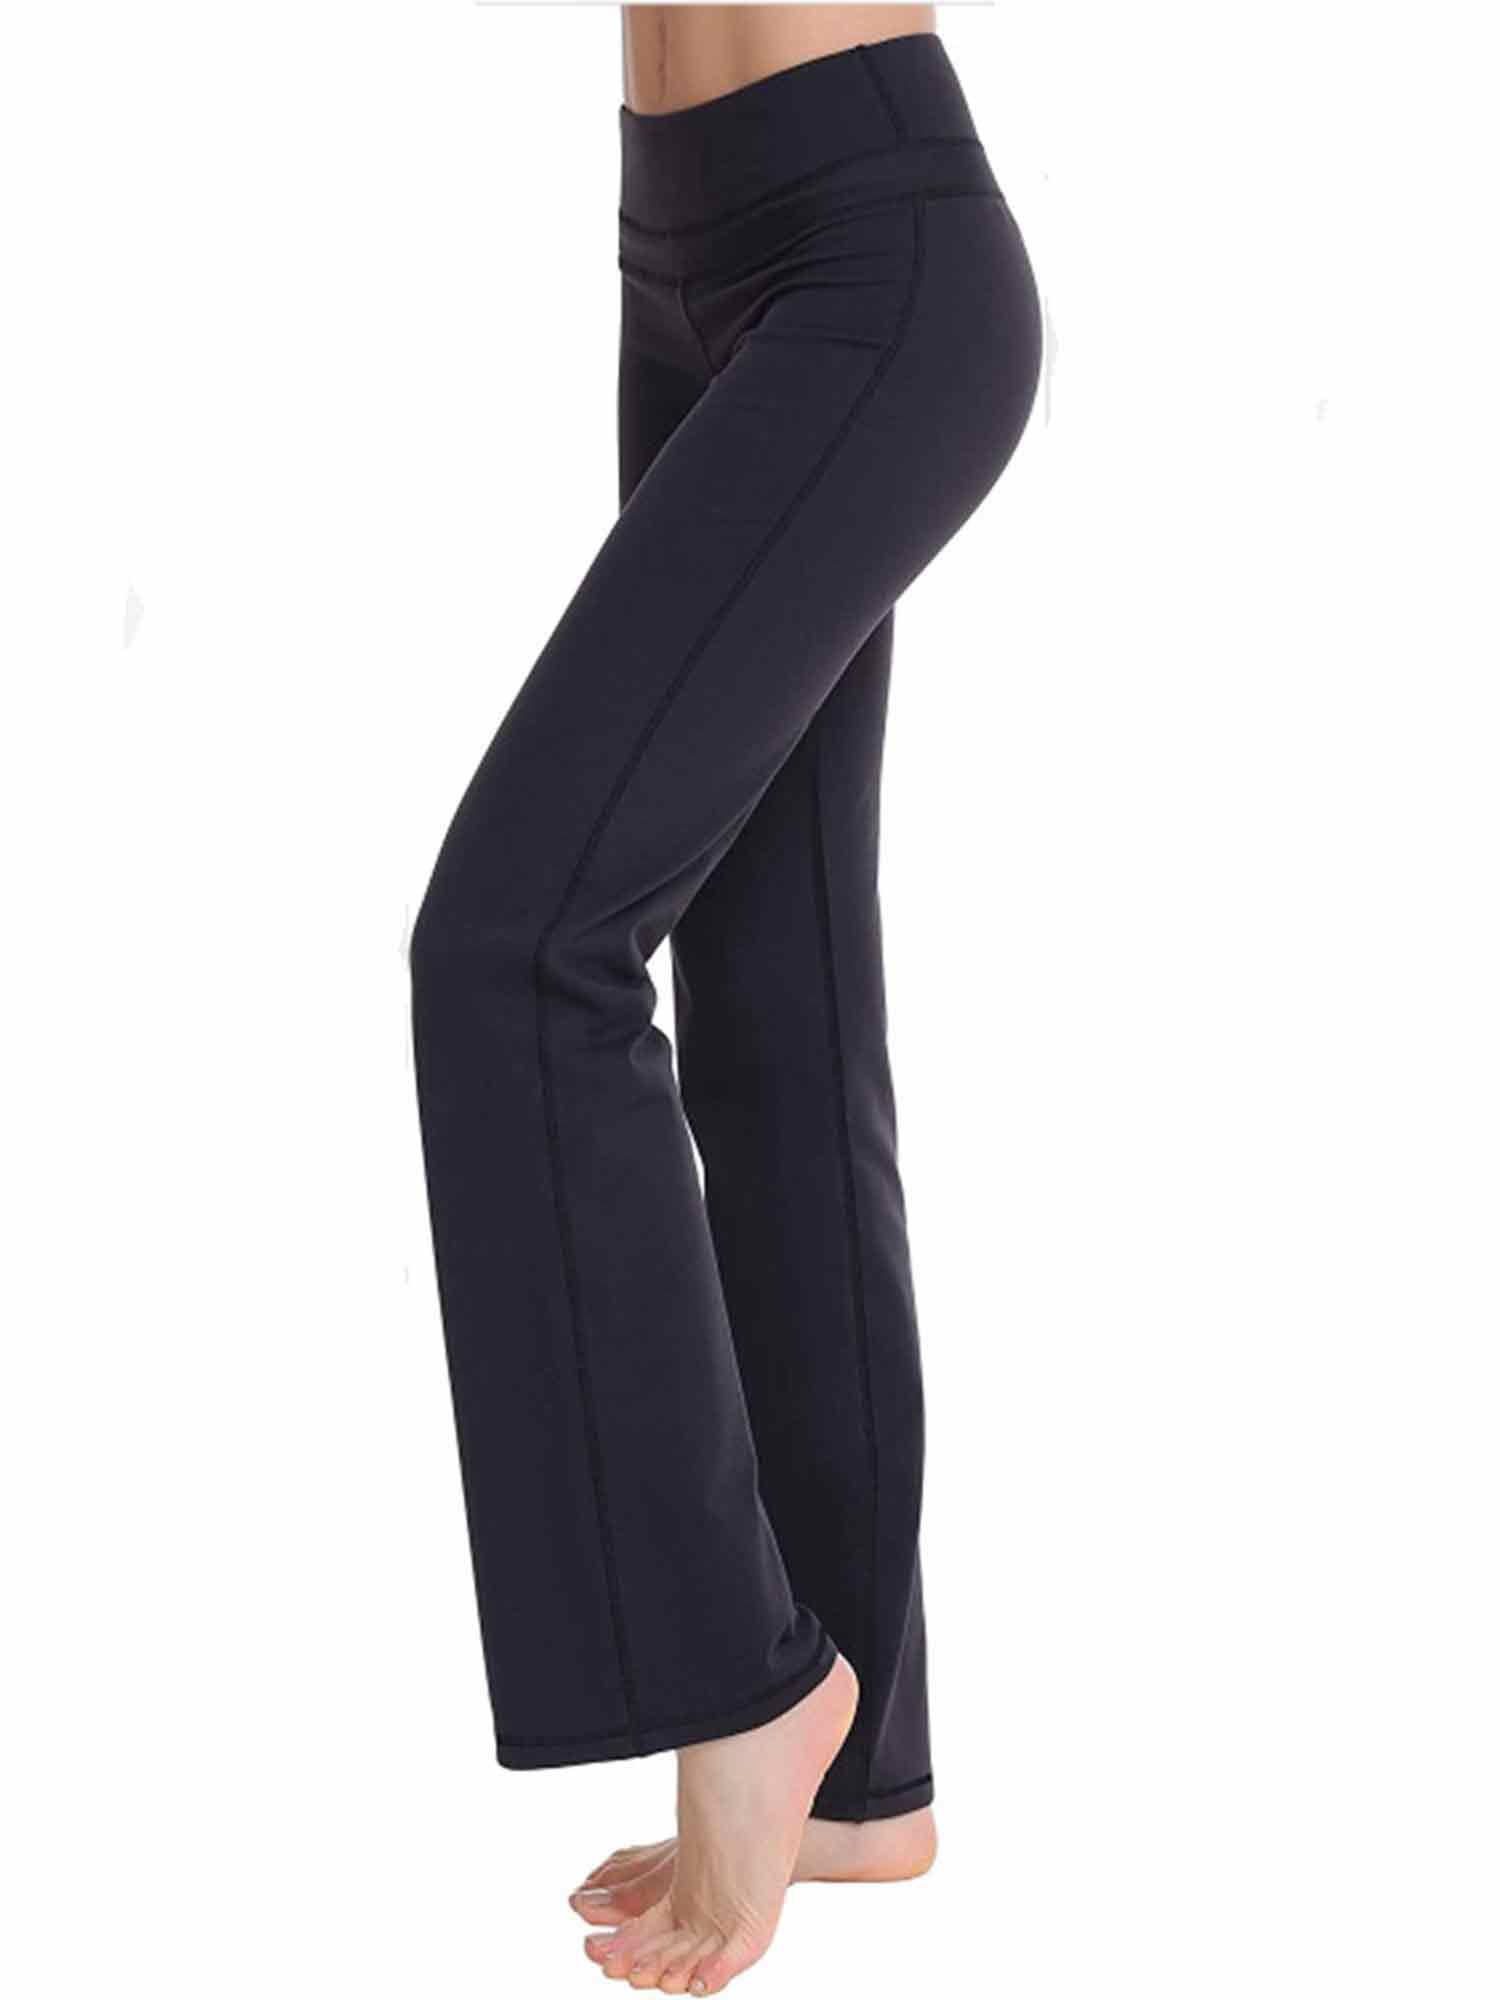 Women Ladies Bootcut Yoga Pants